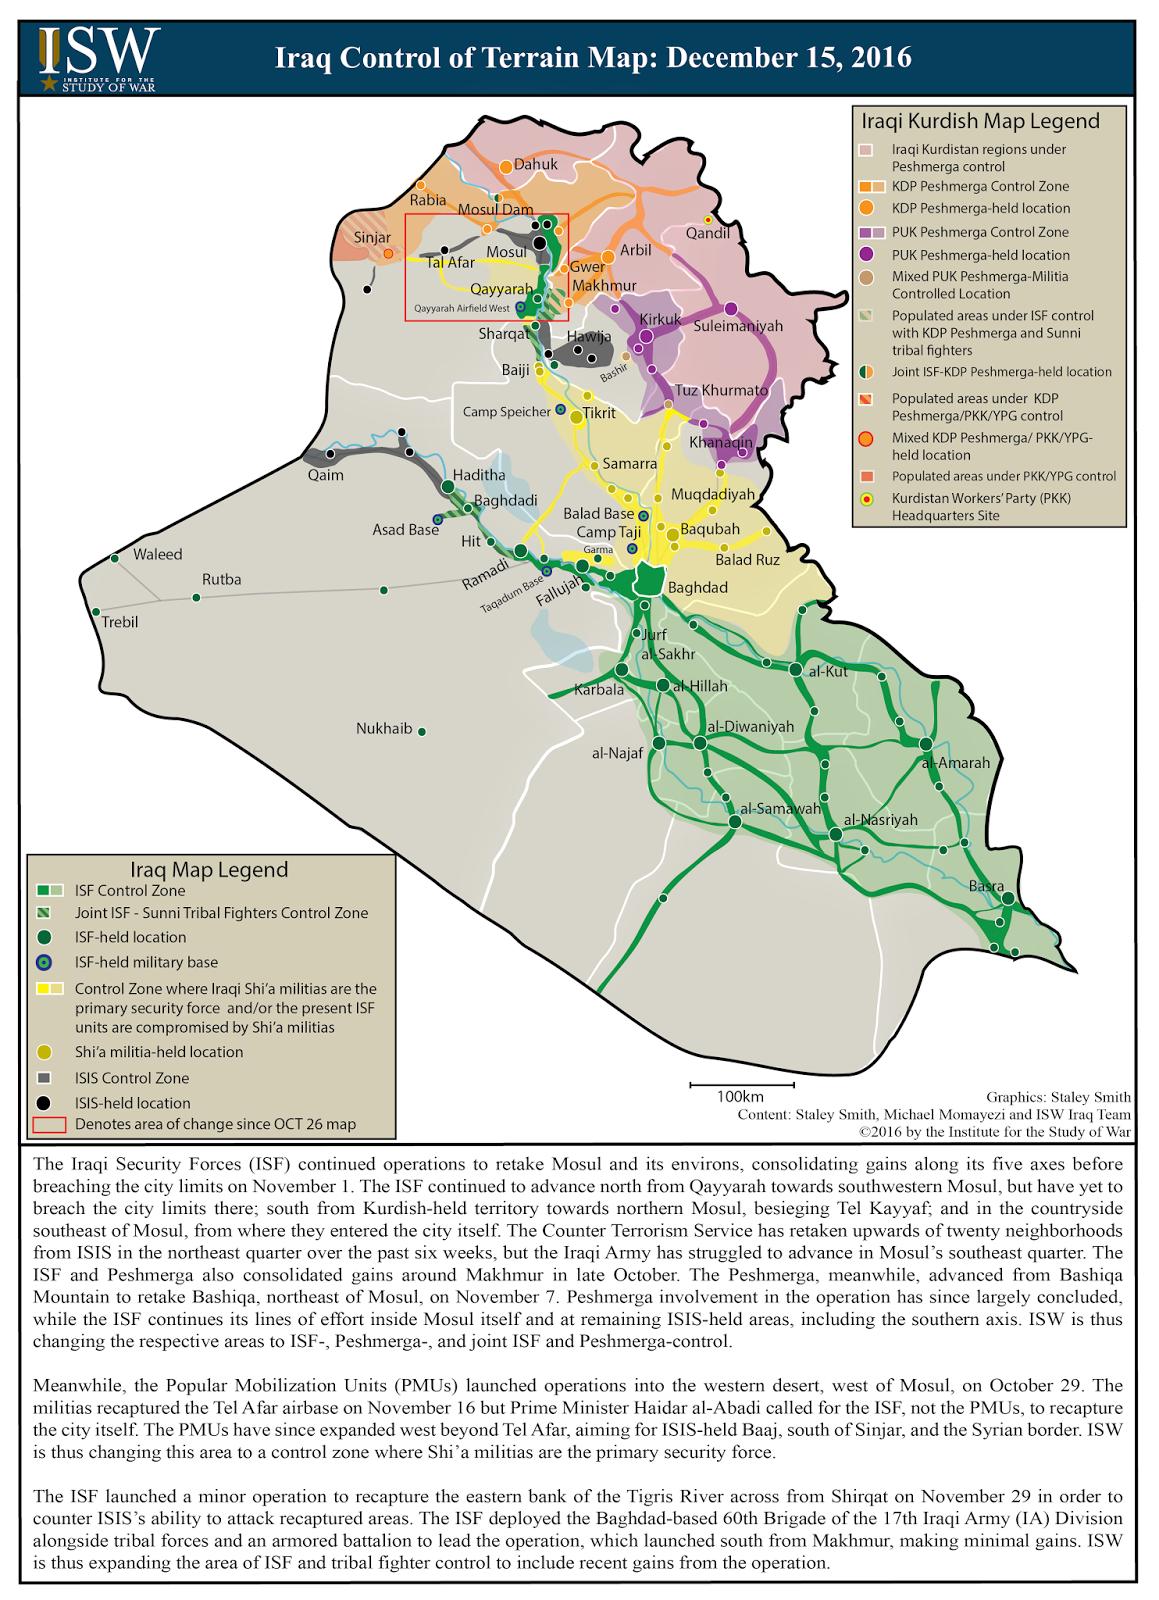 ISW Blog: Iraq Control of Terrain: December 15, 2016